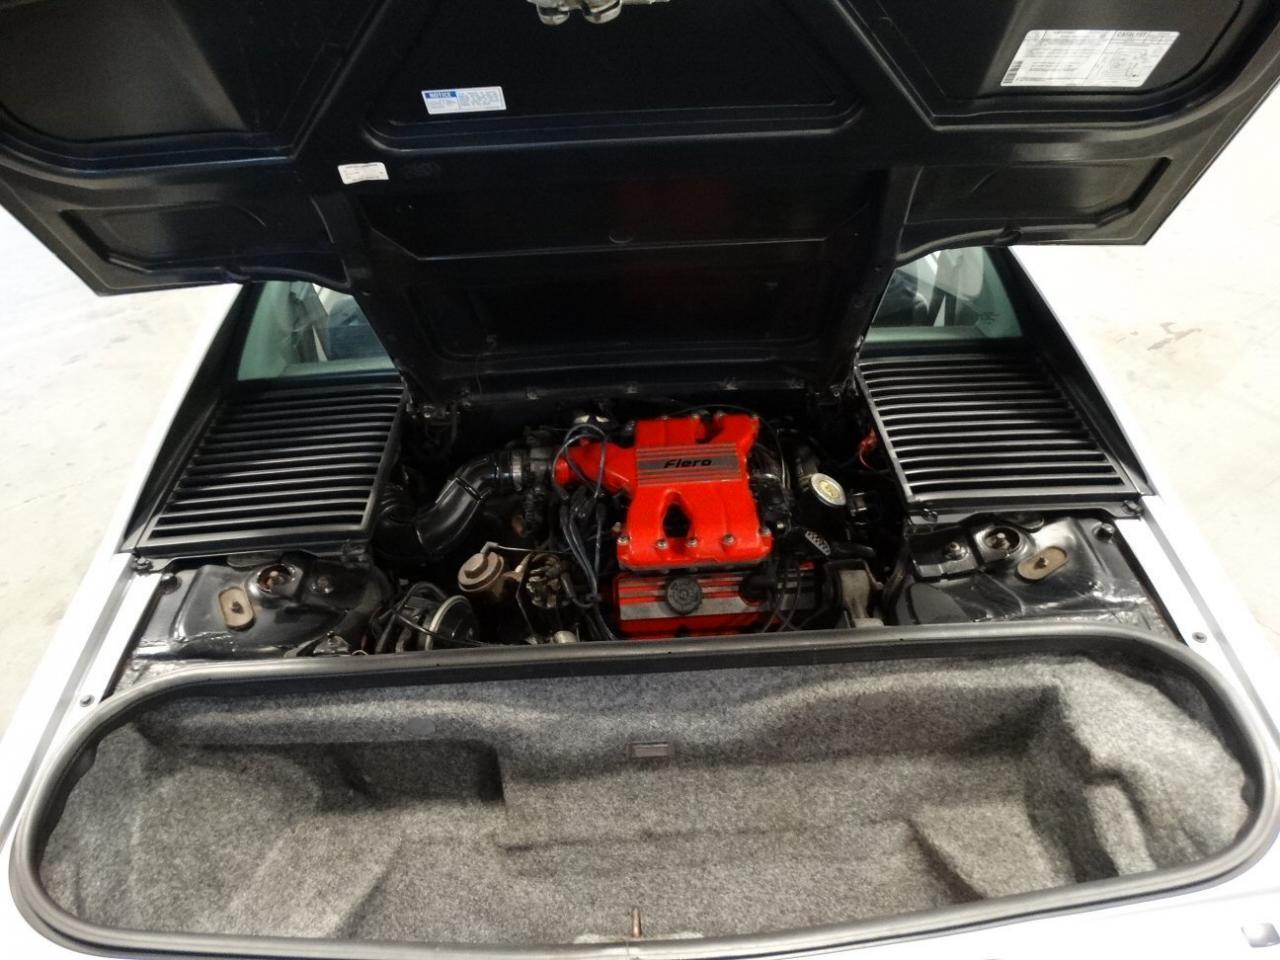 Large Picture of 1985 Pontiac Fiero - $6,995.00 - KDWK